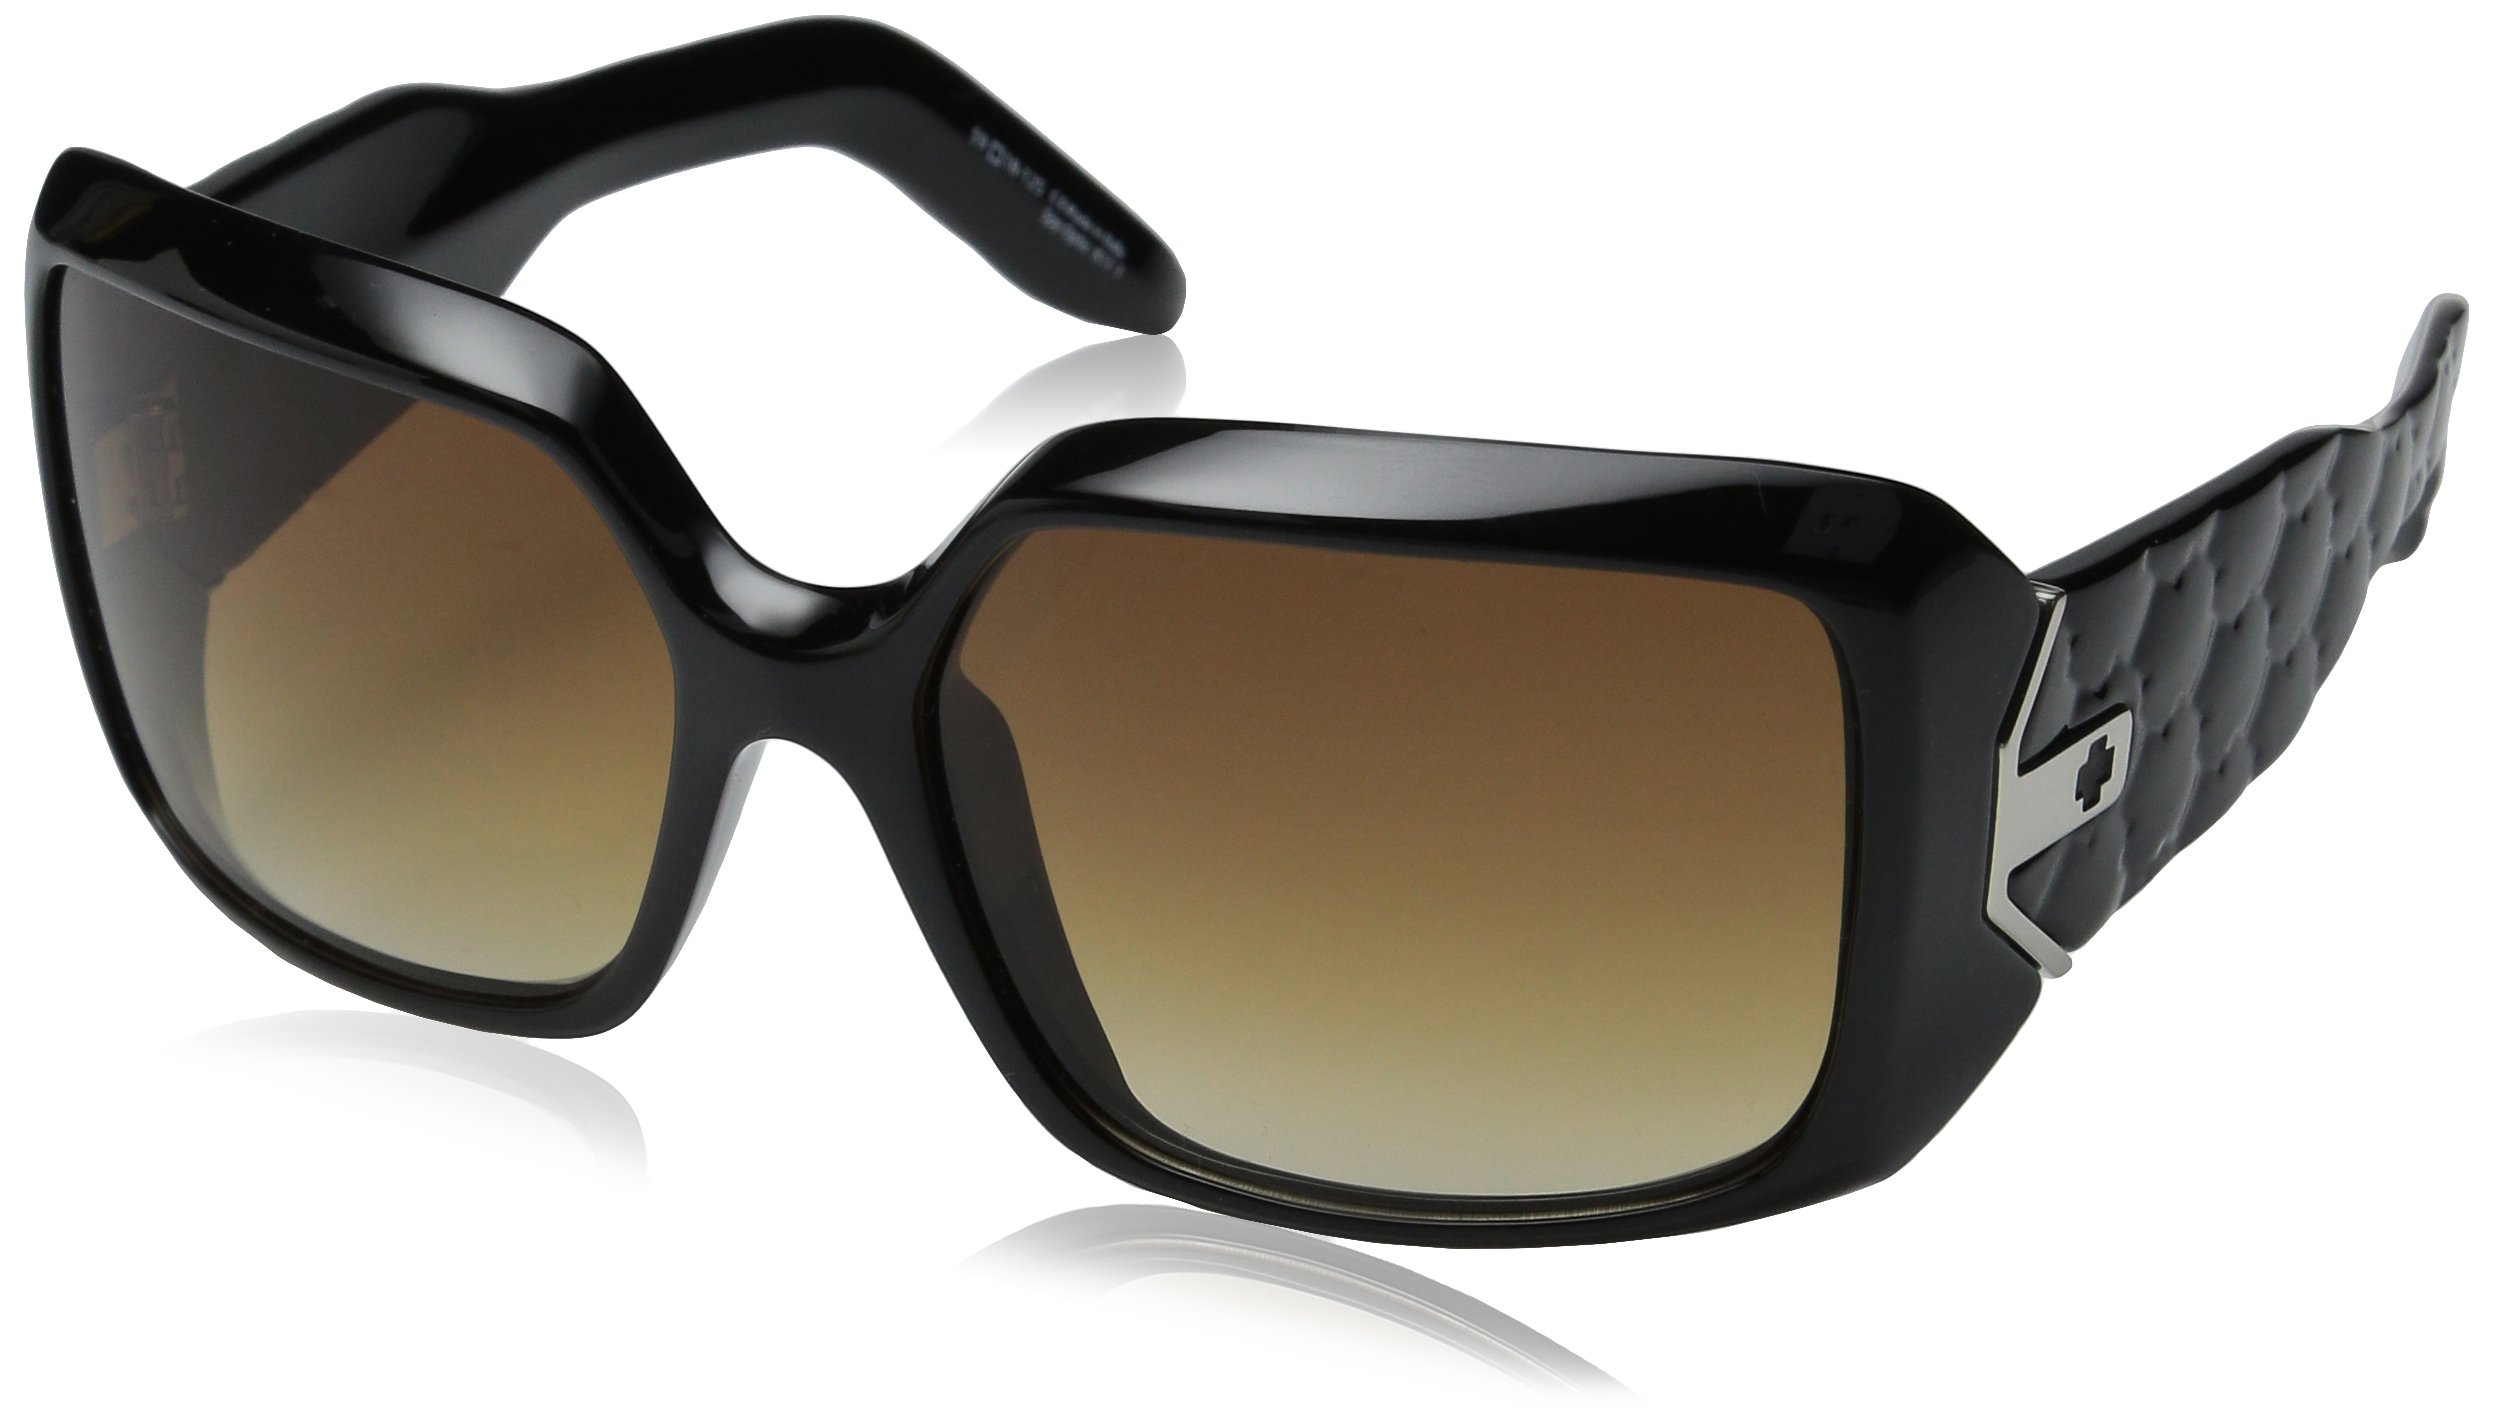 Spy Optic Women's Eliza Fade Sunglasses,Shiny Black Frame/Bronze Fade Lens,one size